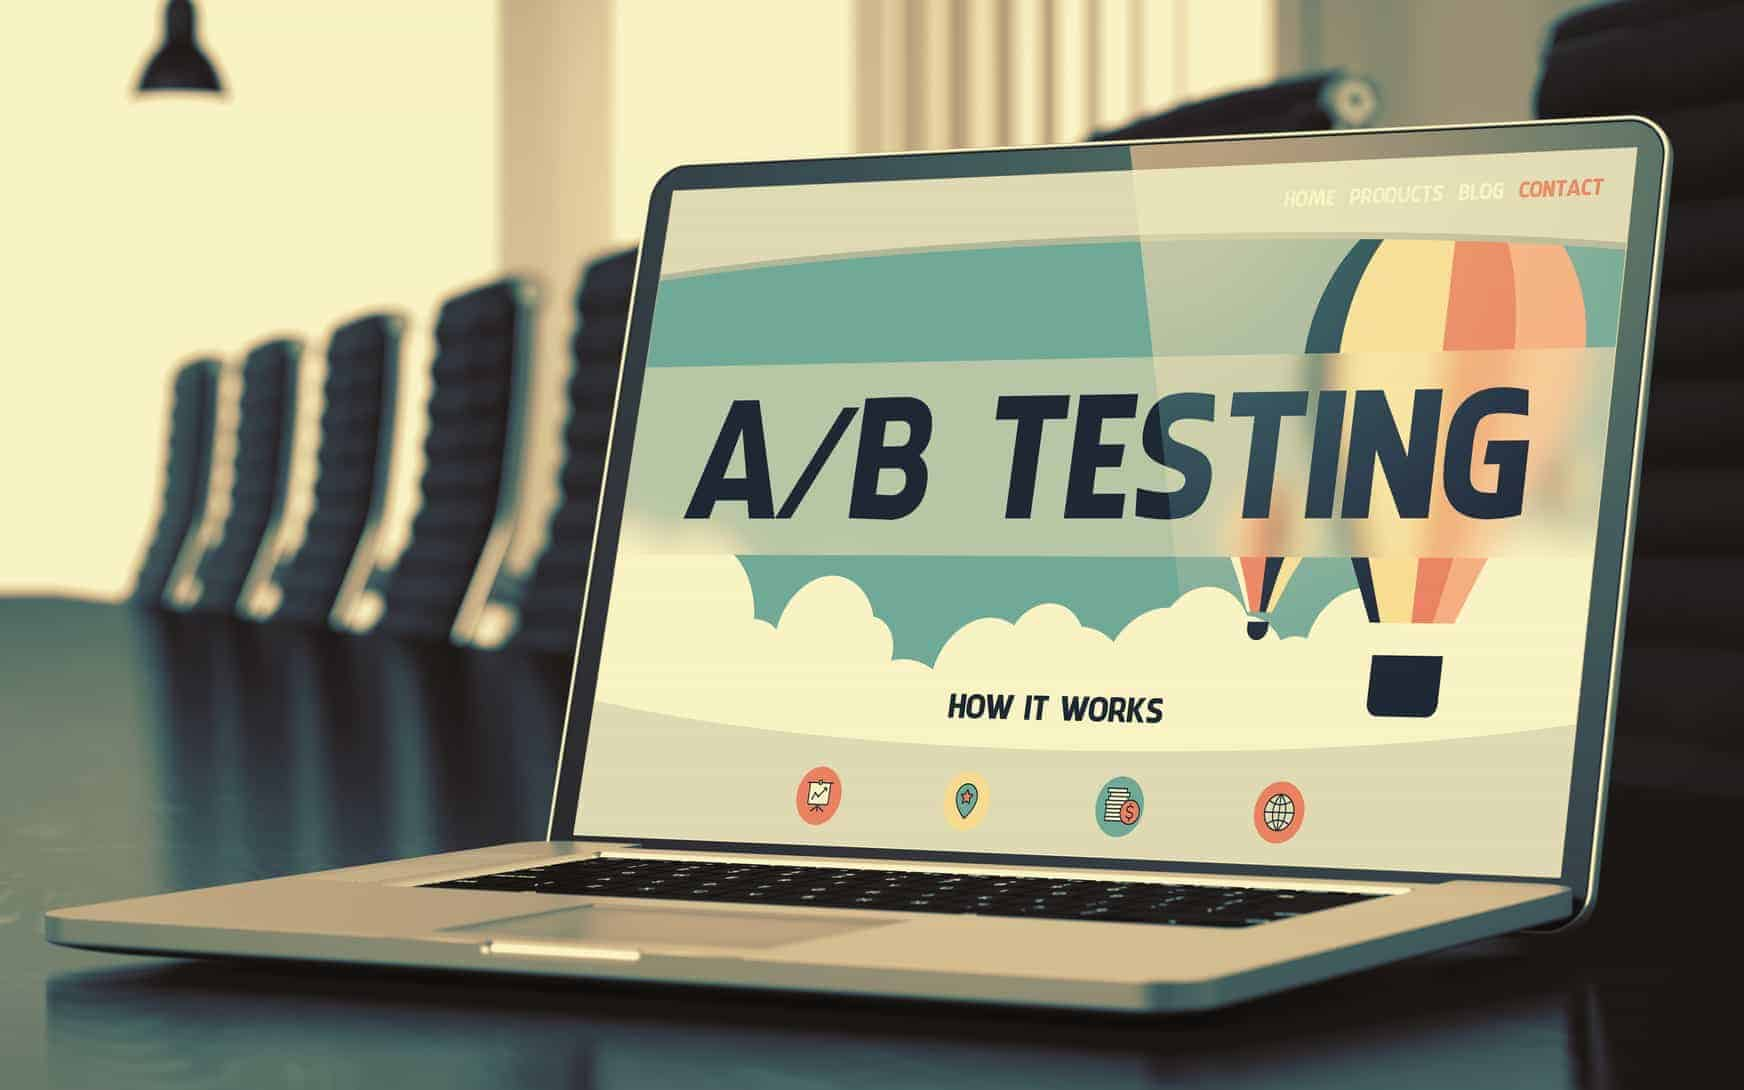 A/B Testing - on Laptop Screen